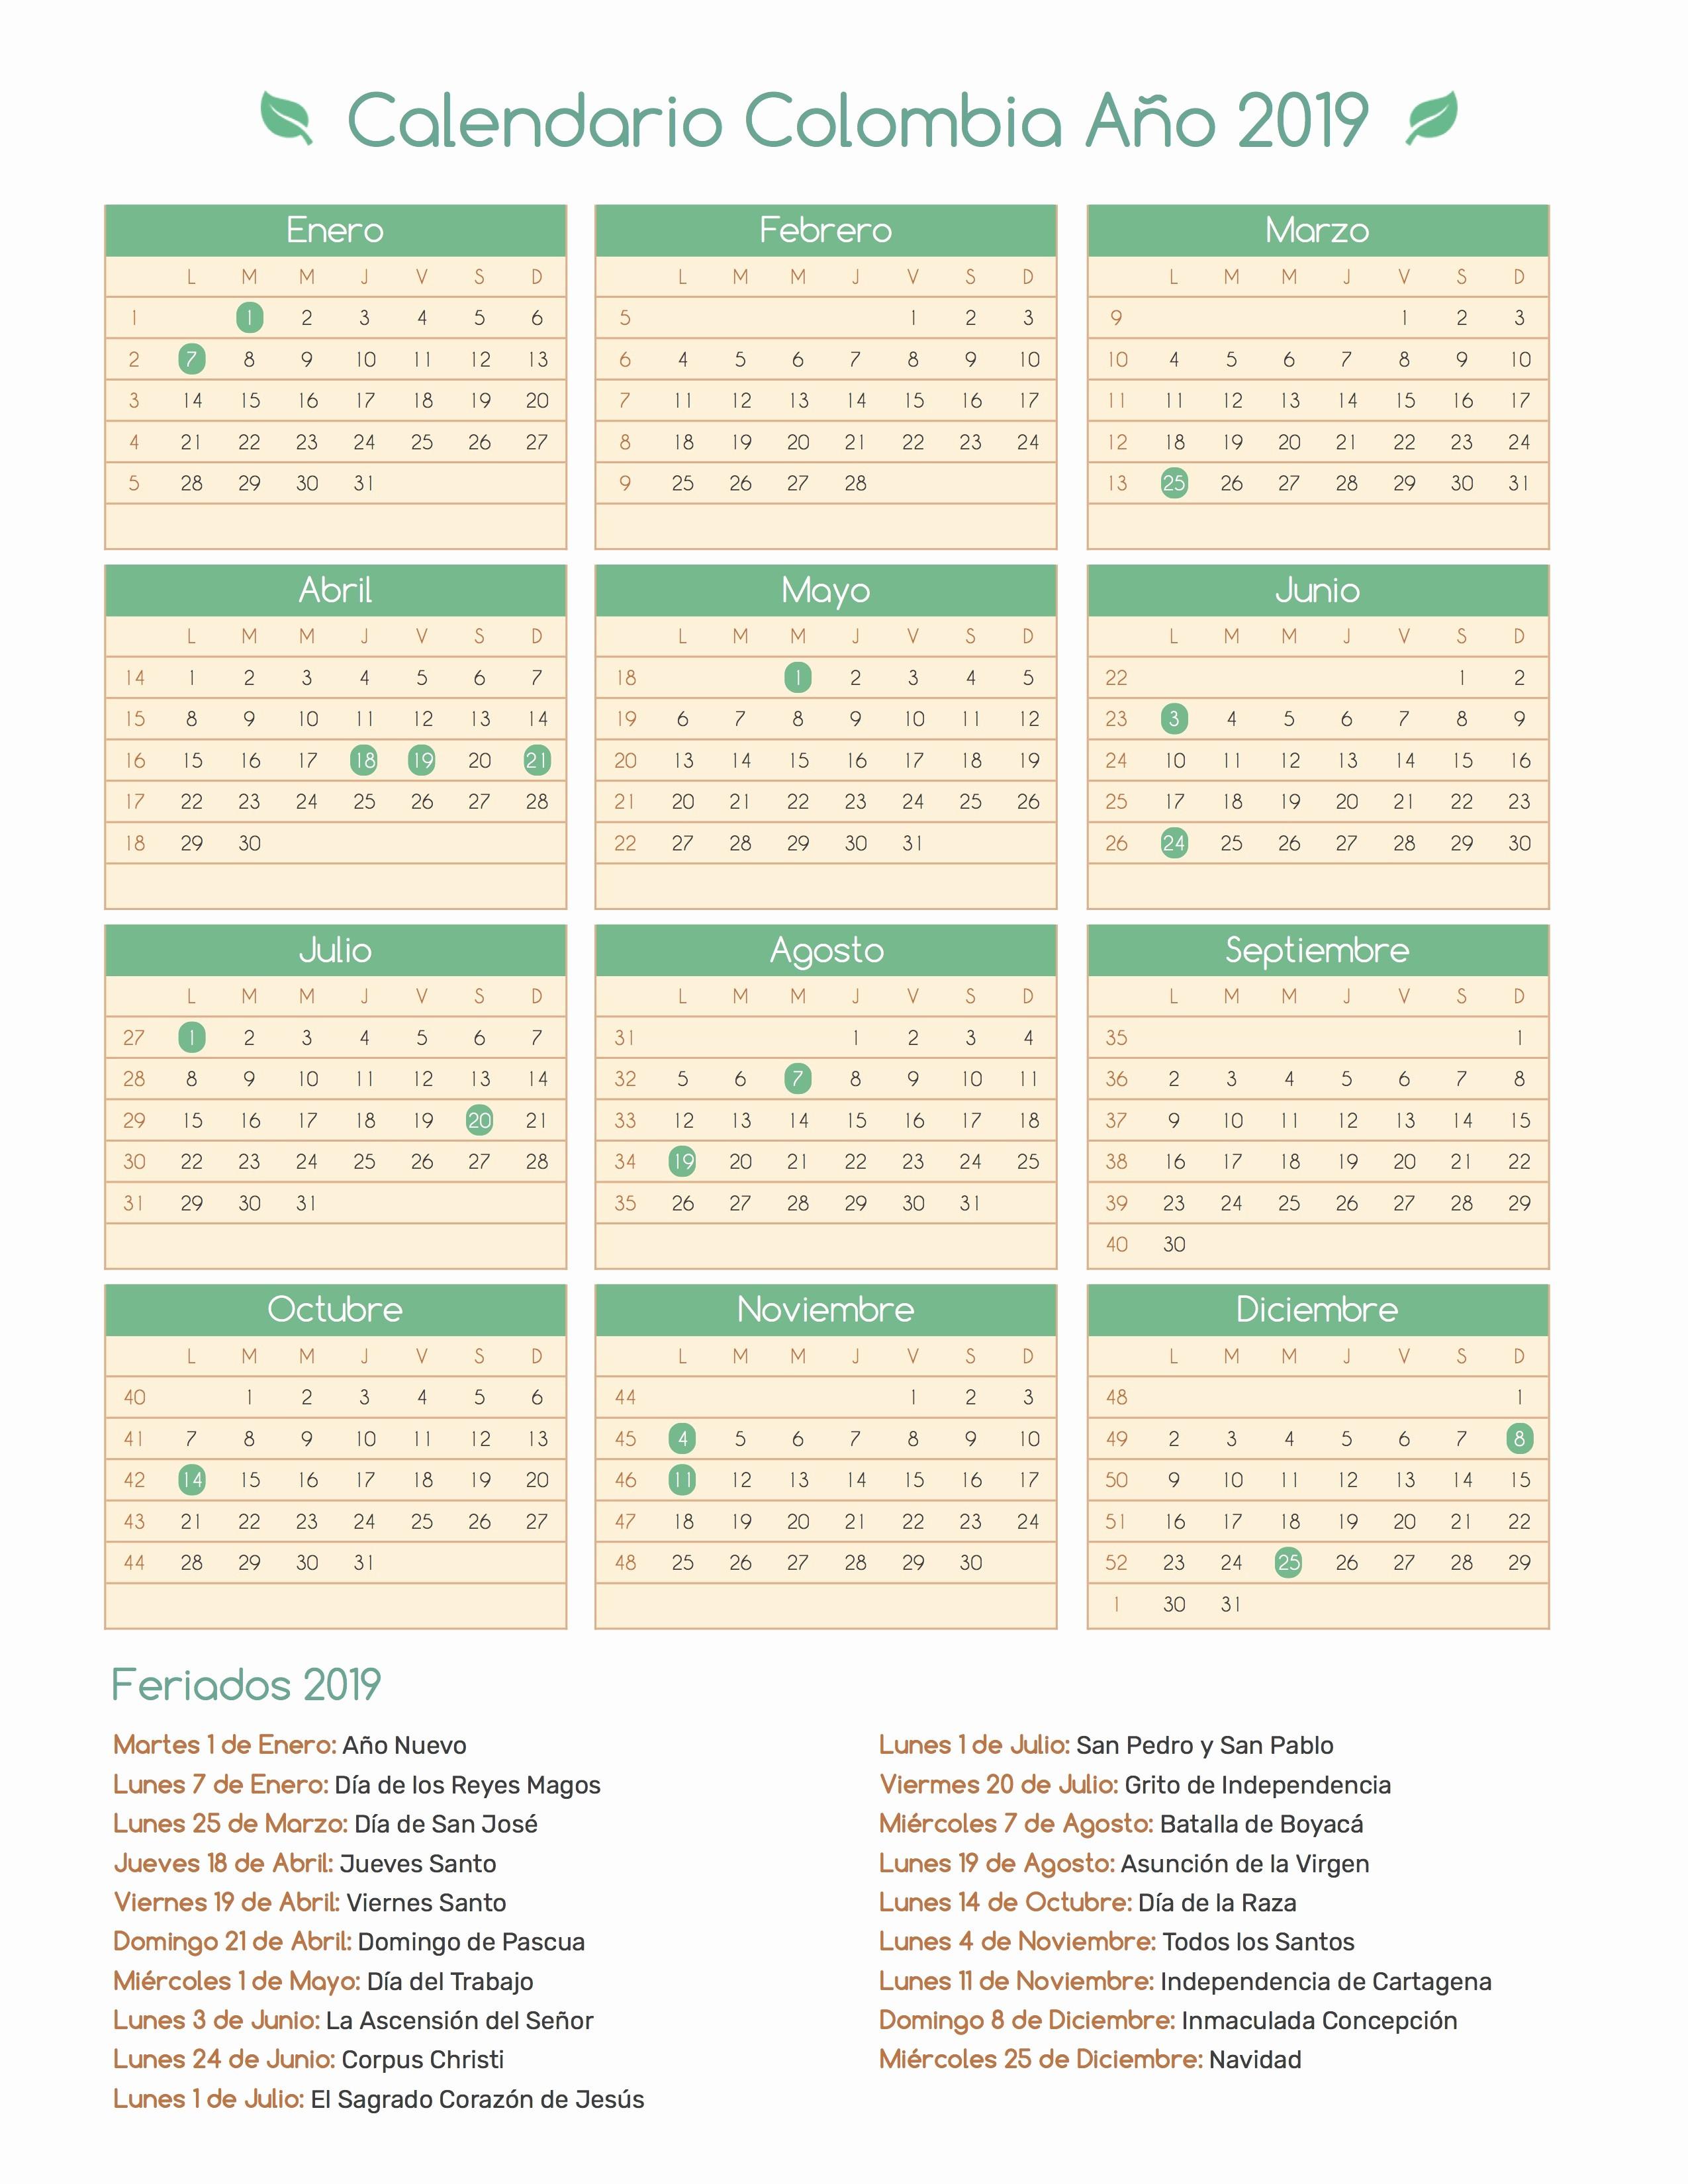 Calendario Ade Uma 2019 Calendario Colombia Ano 2019 Feriados